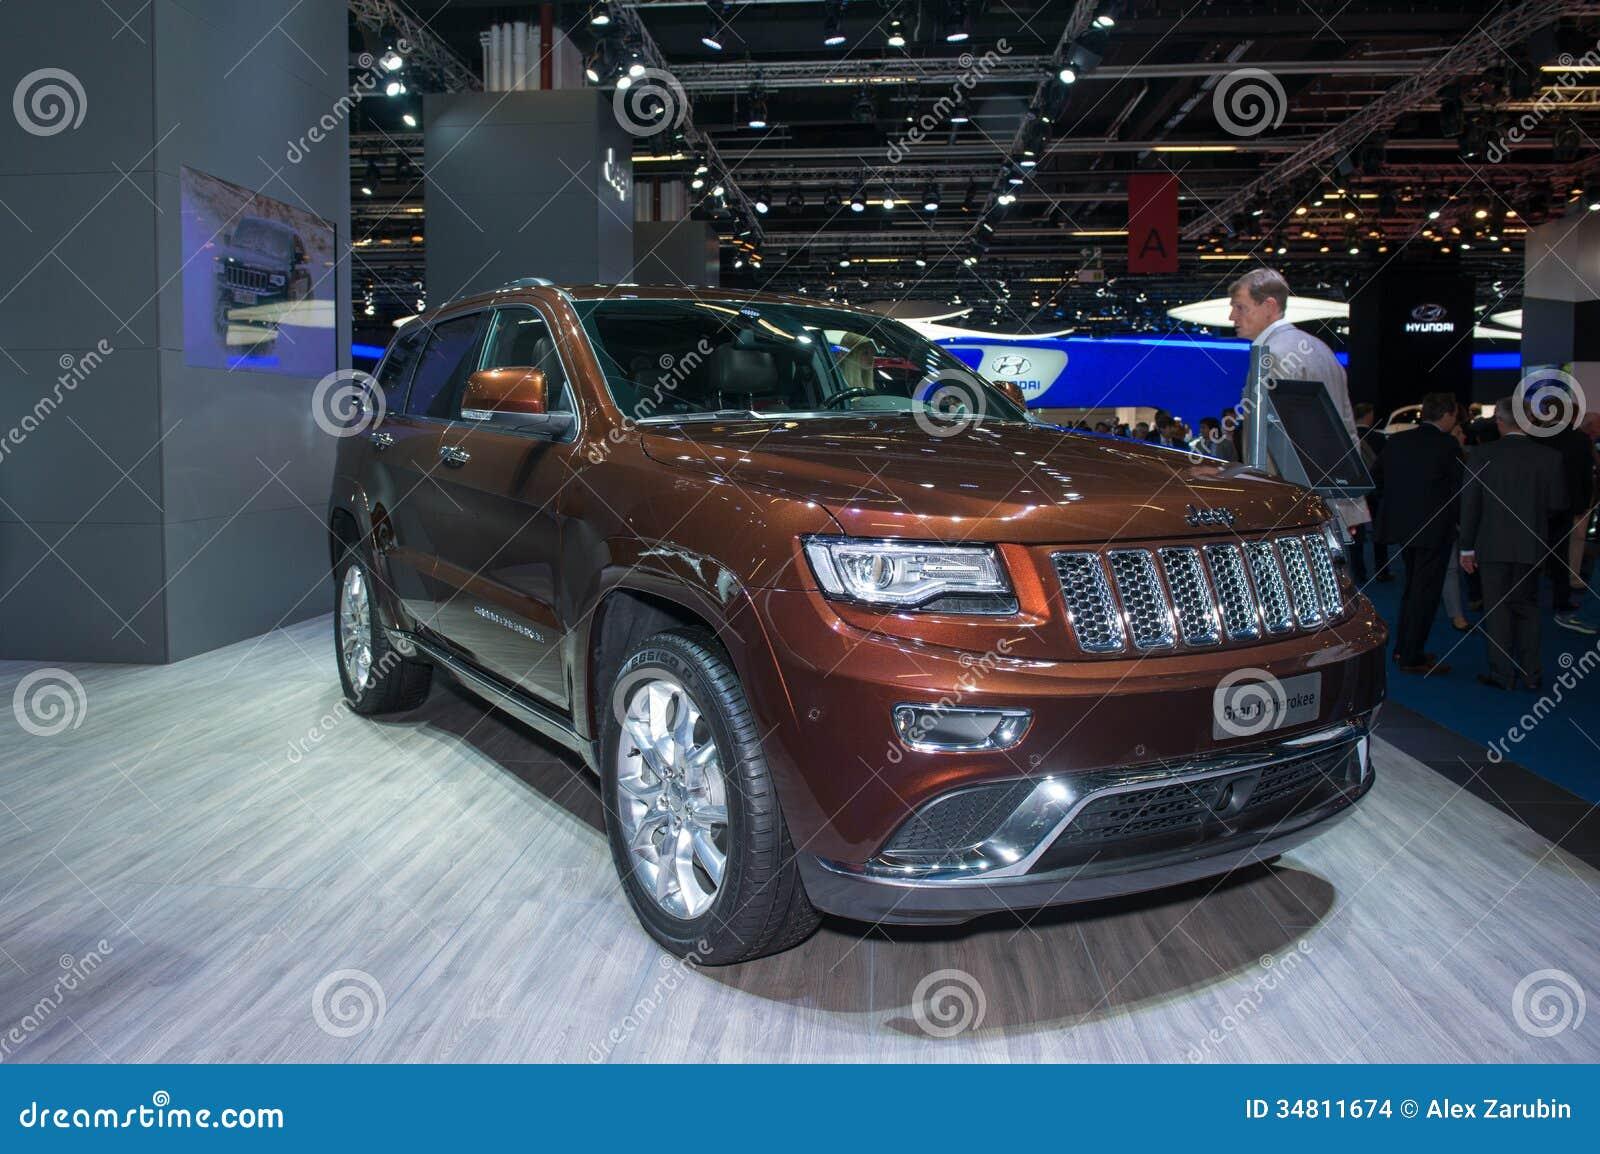 2014 Jeep Grand Cheroke ercial Spokesperso